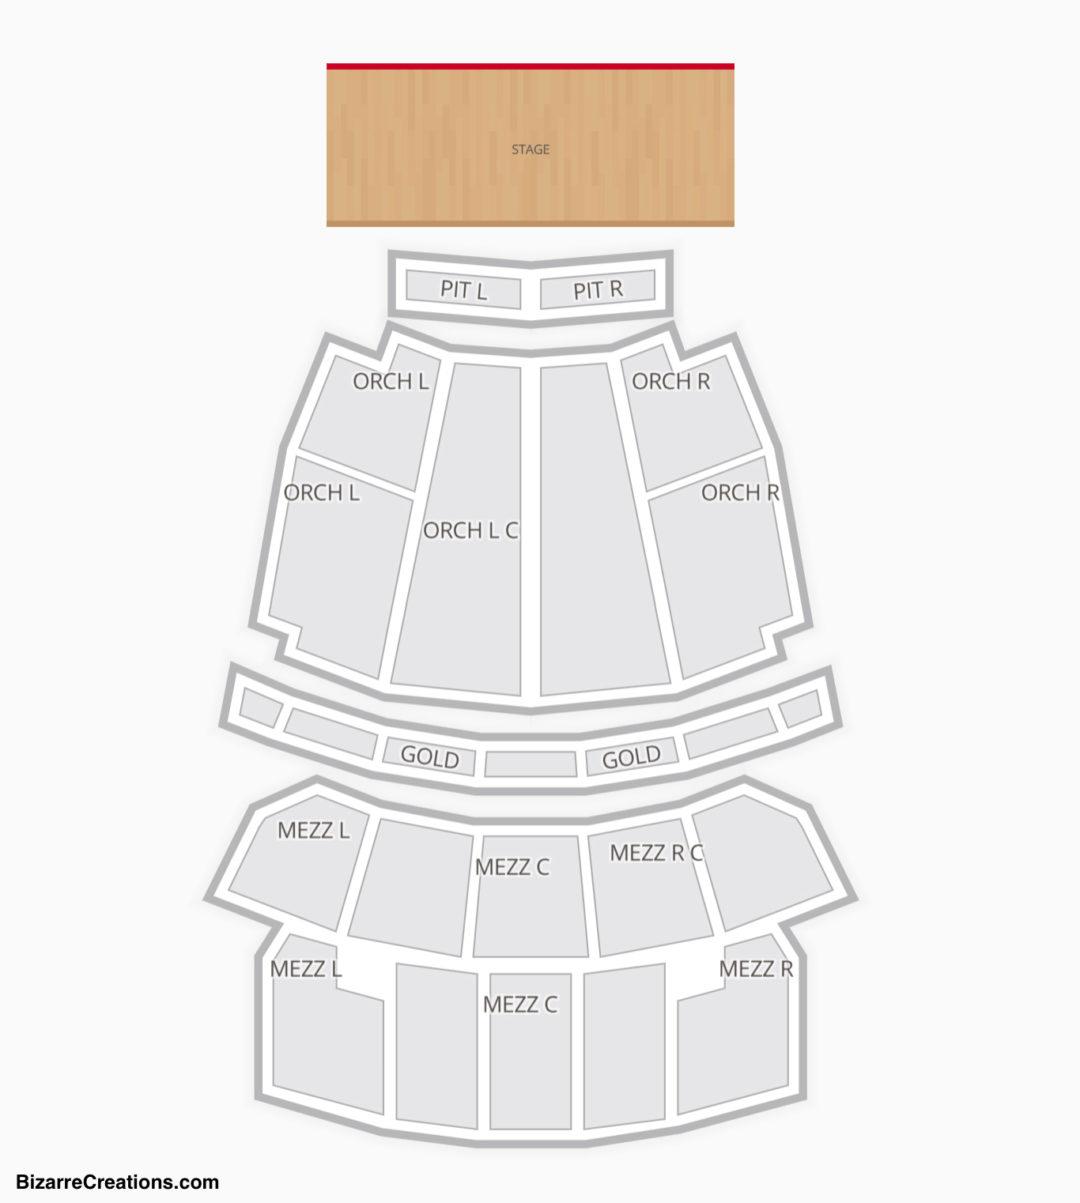 Peabody Opera House Seating Chart